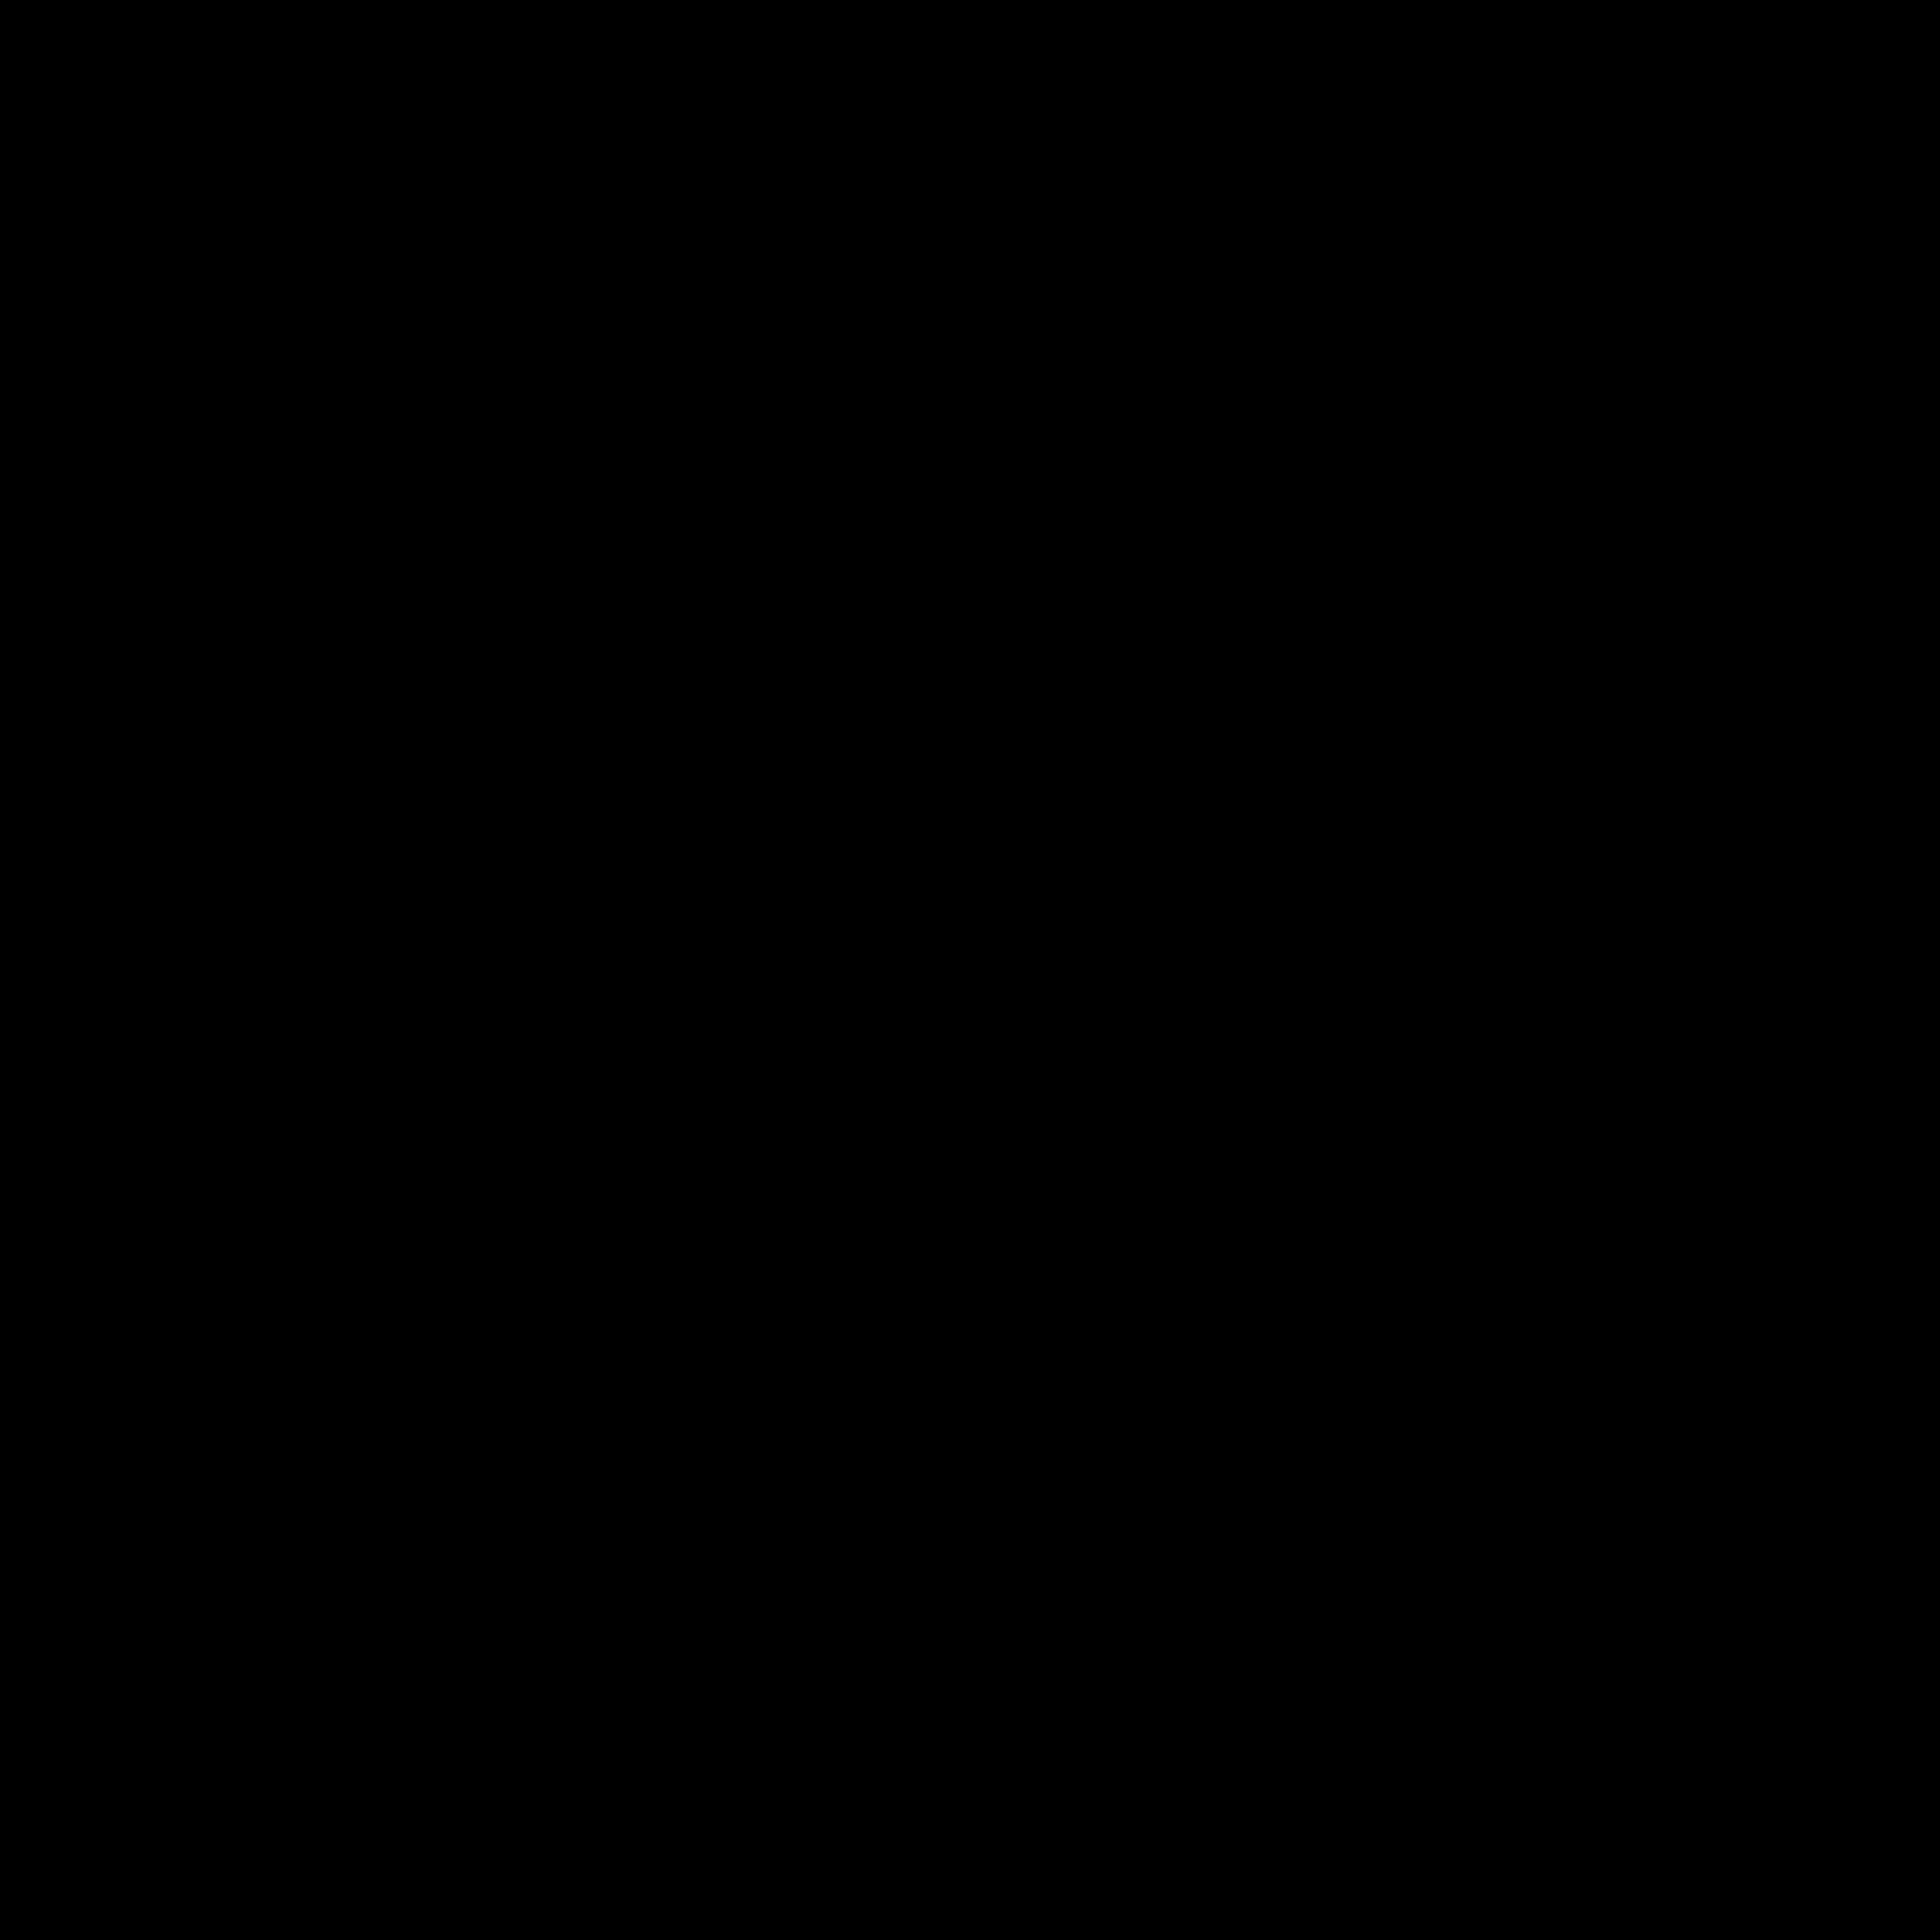 2000px-Apple_logo_black.svg